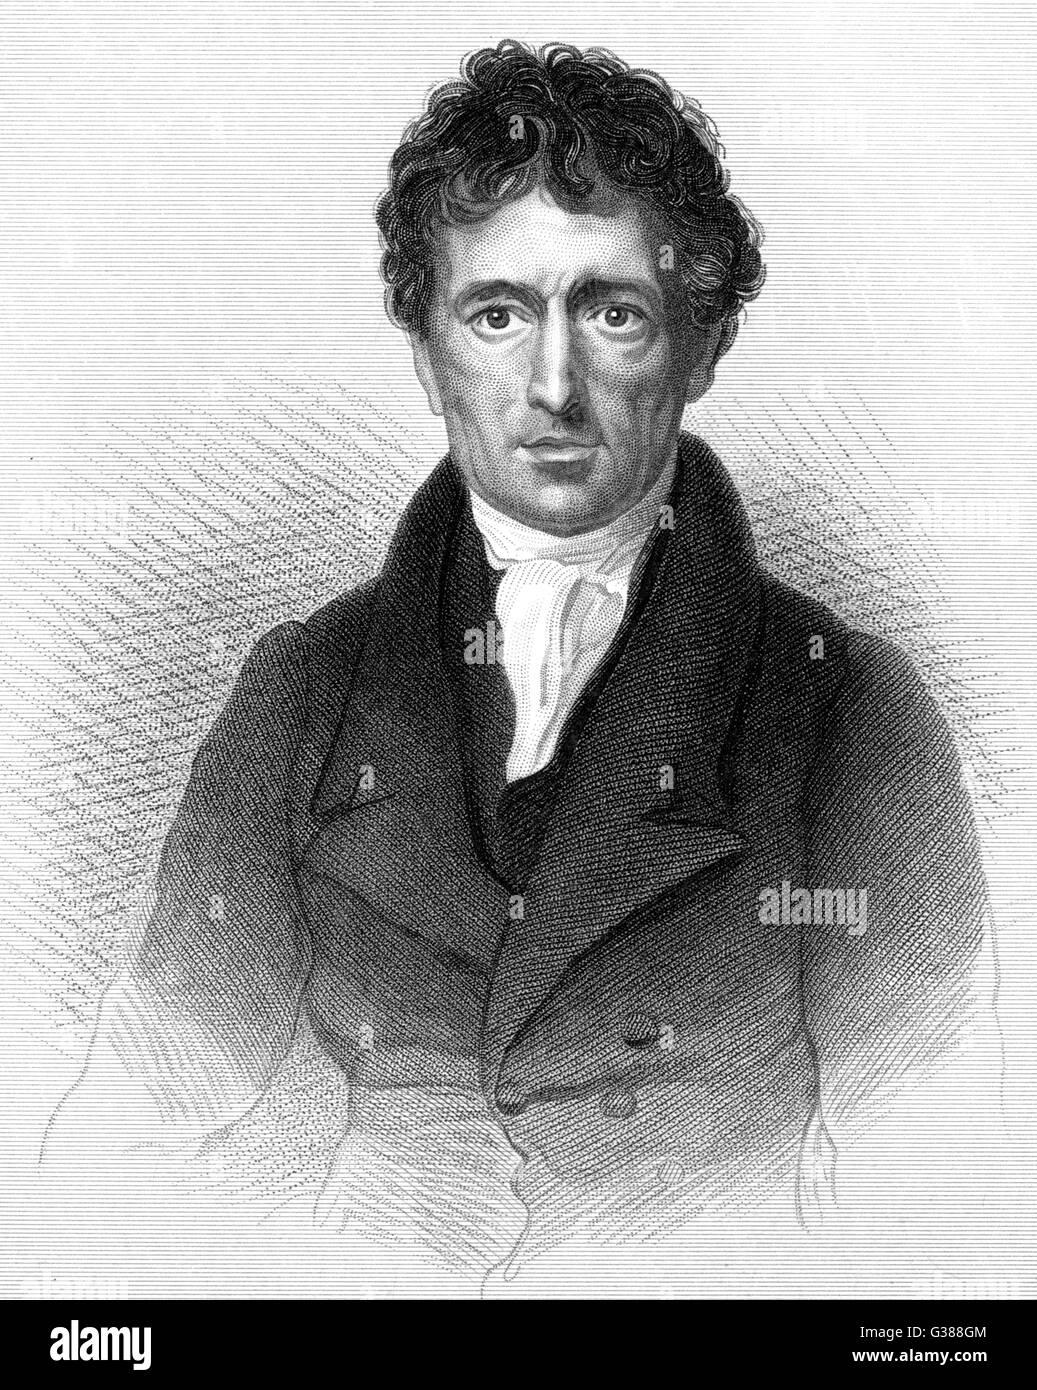 CHARLES LAMB  Writer        Date: 1775 - 1834 - Stock Image